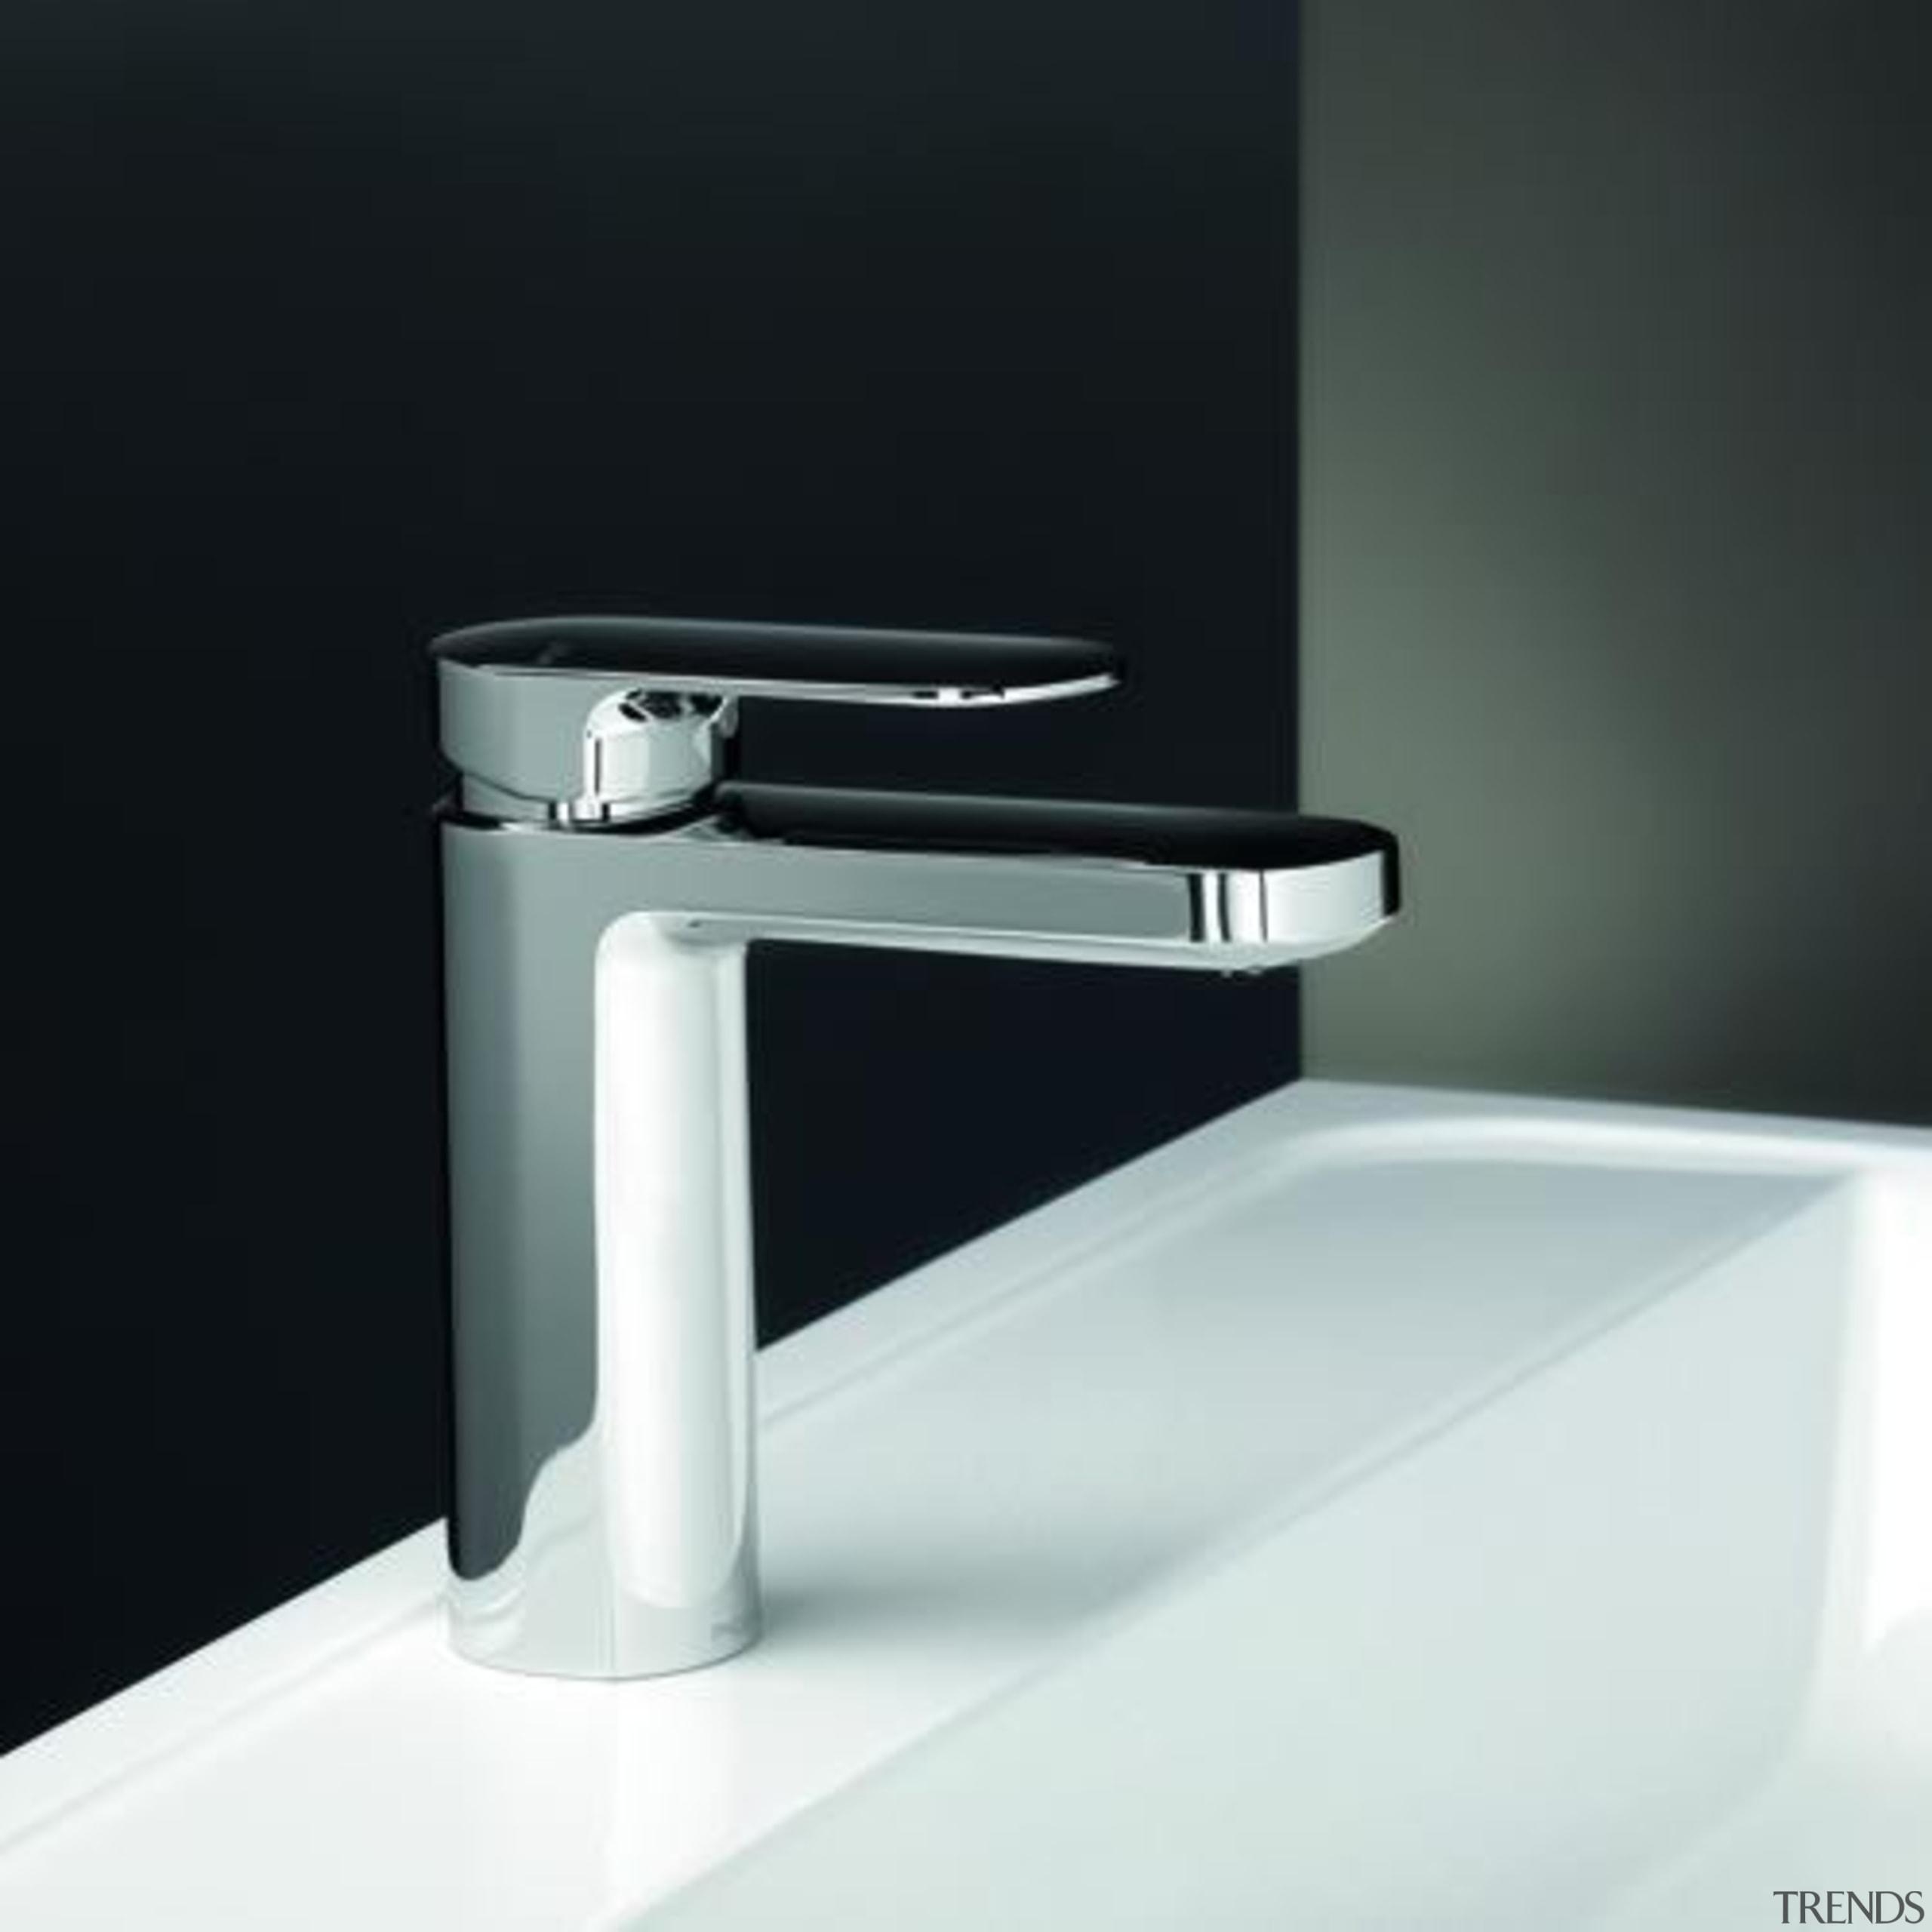 cerchionewv65038hero.jpg - cerchionewv65038hero.jpg - angle | bathroom sink angle, bathroom sink, hardware, plumbing fixture, product, product design, tap, black, white